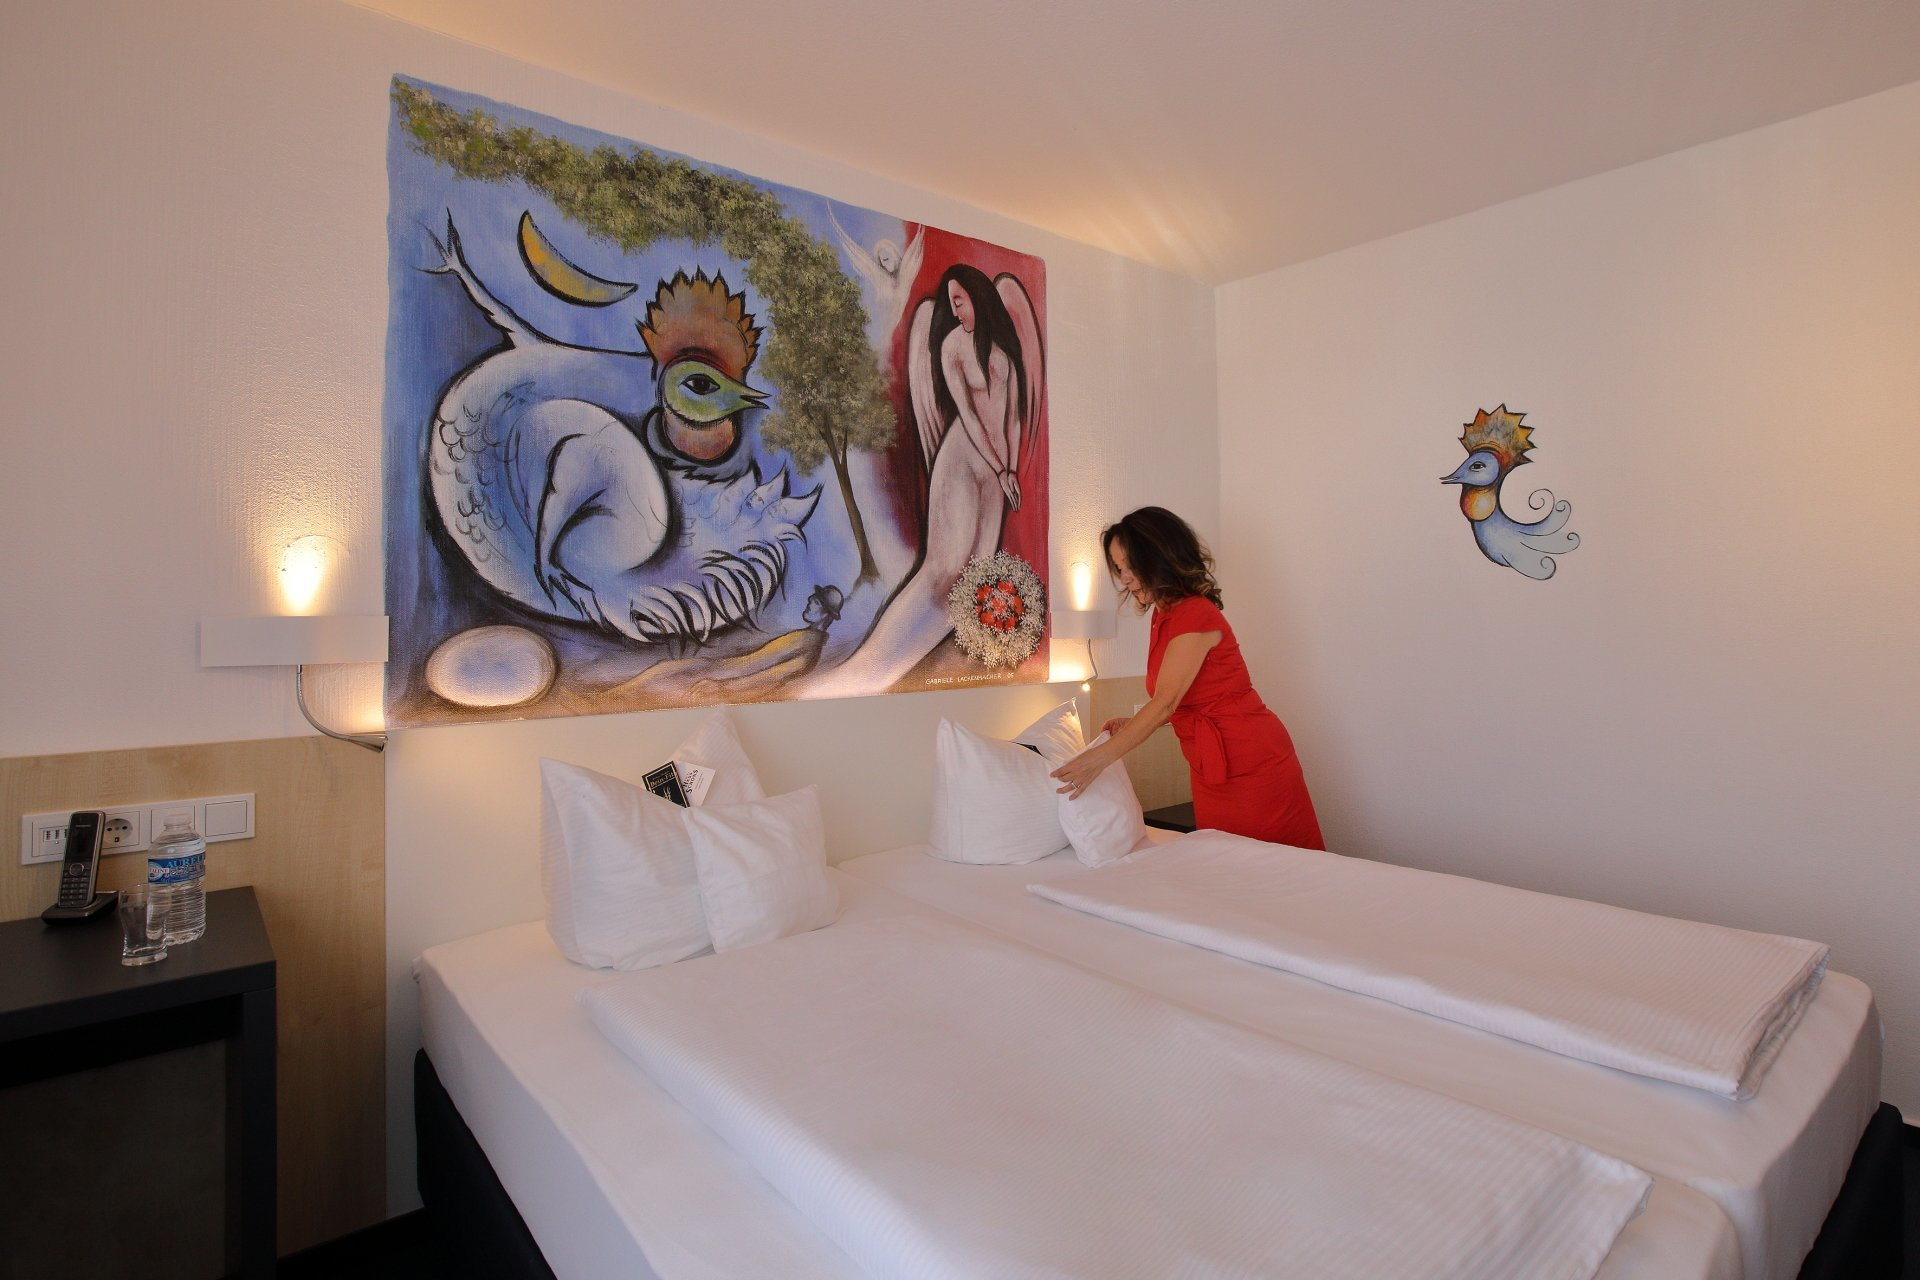 Hotel Hotel Haus Schons in Mettlach